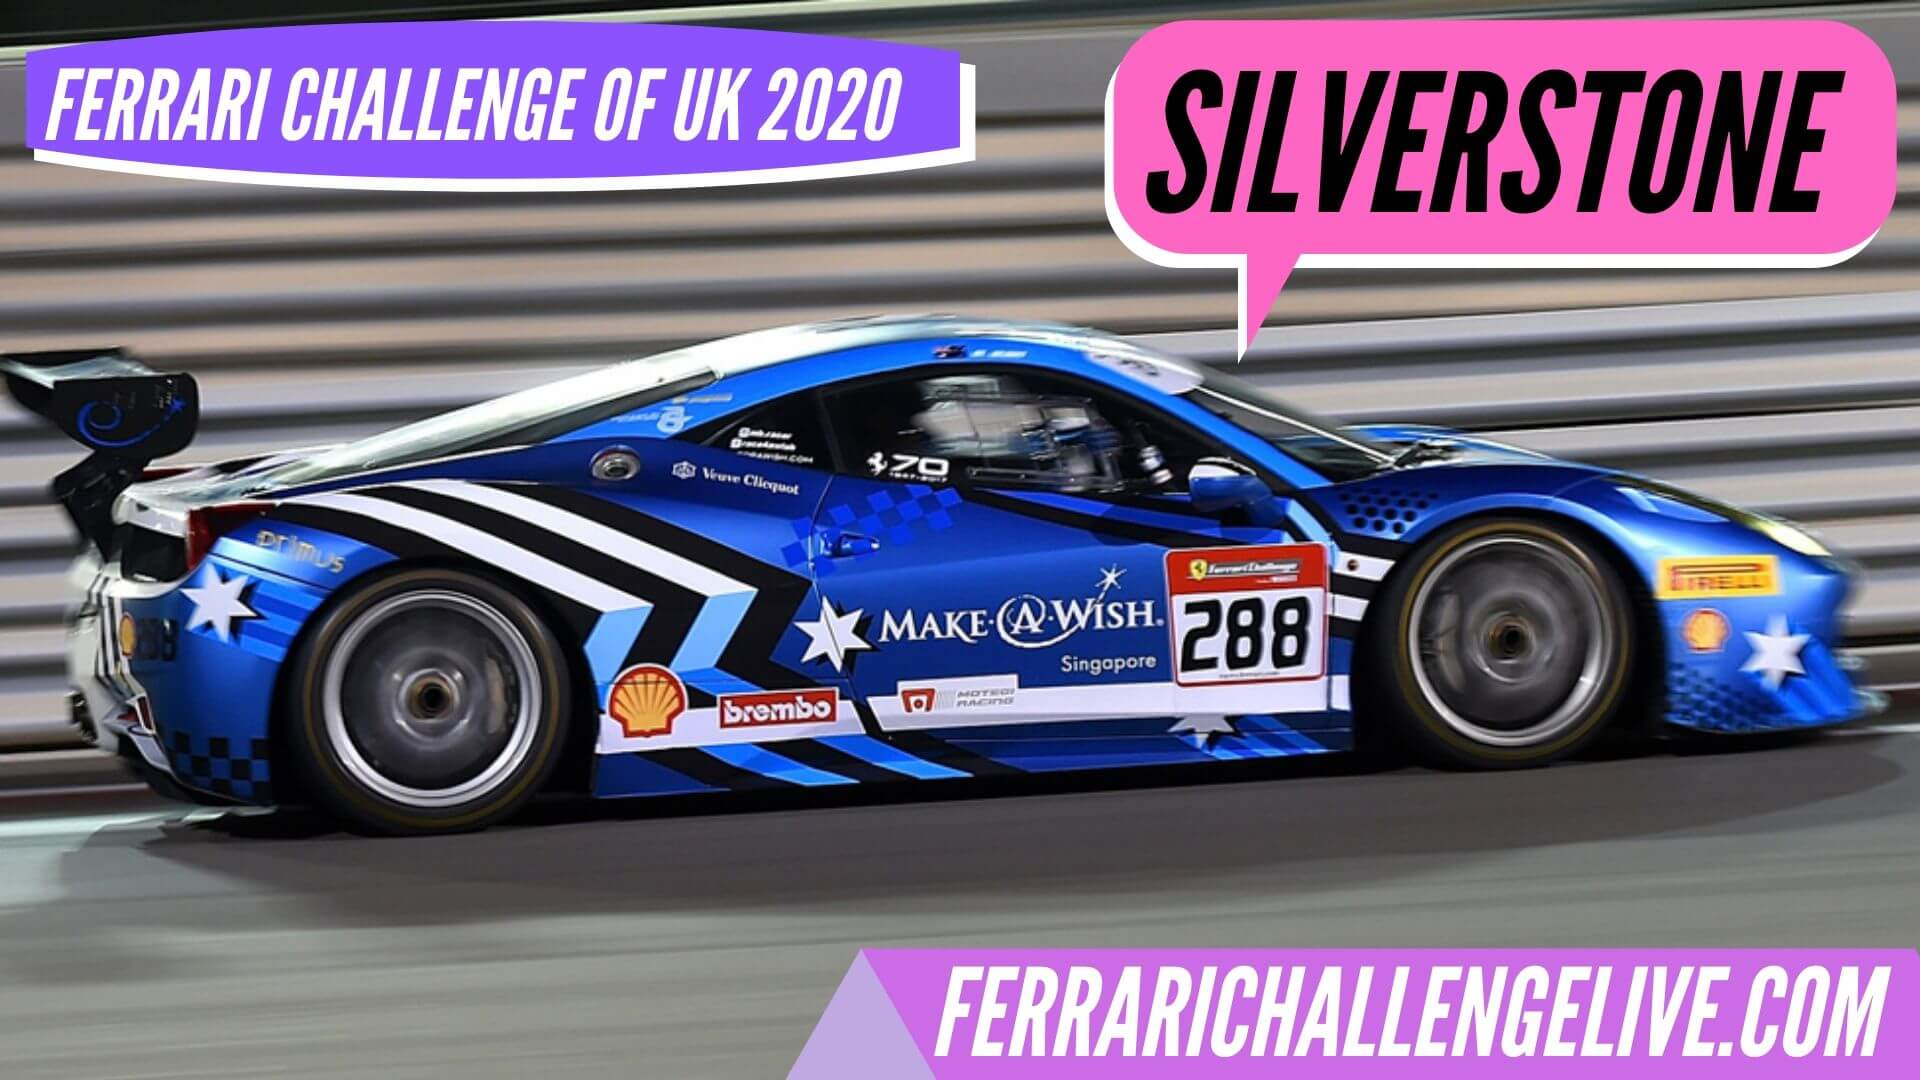 Silverstone Live Stream 2020 | Ferrari Challenge UK